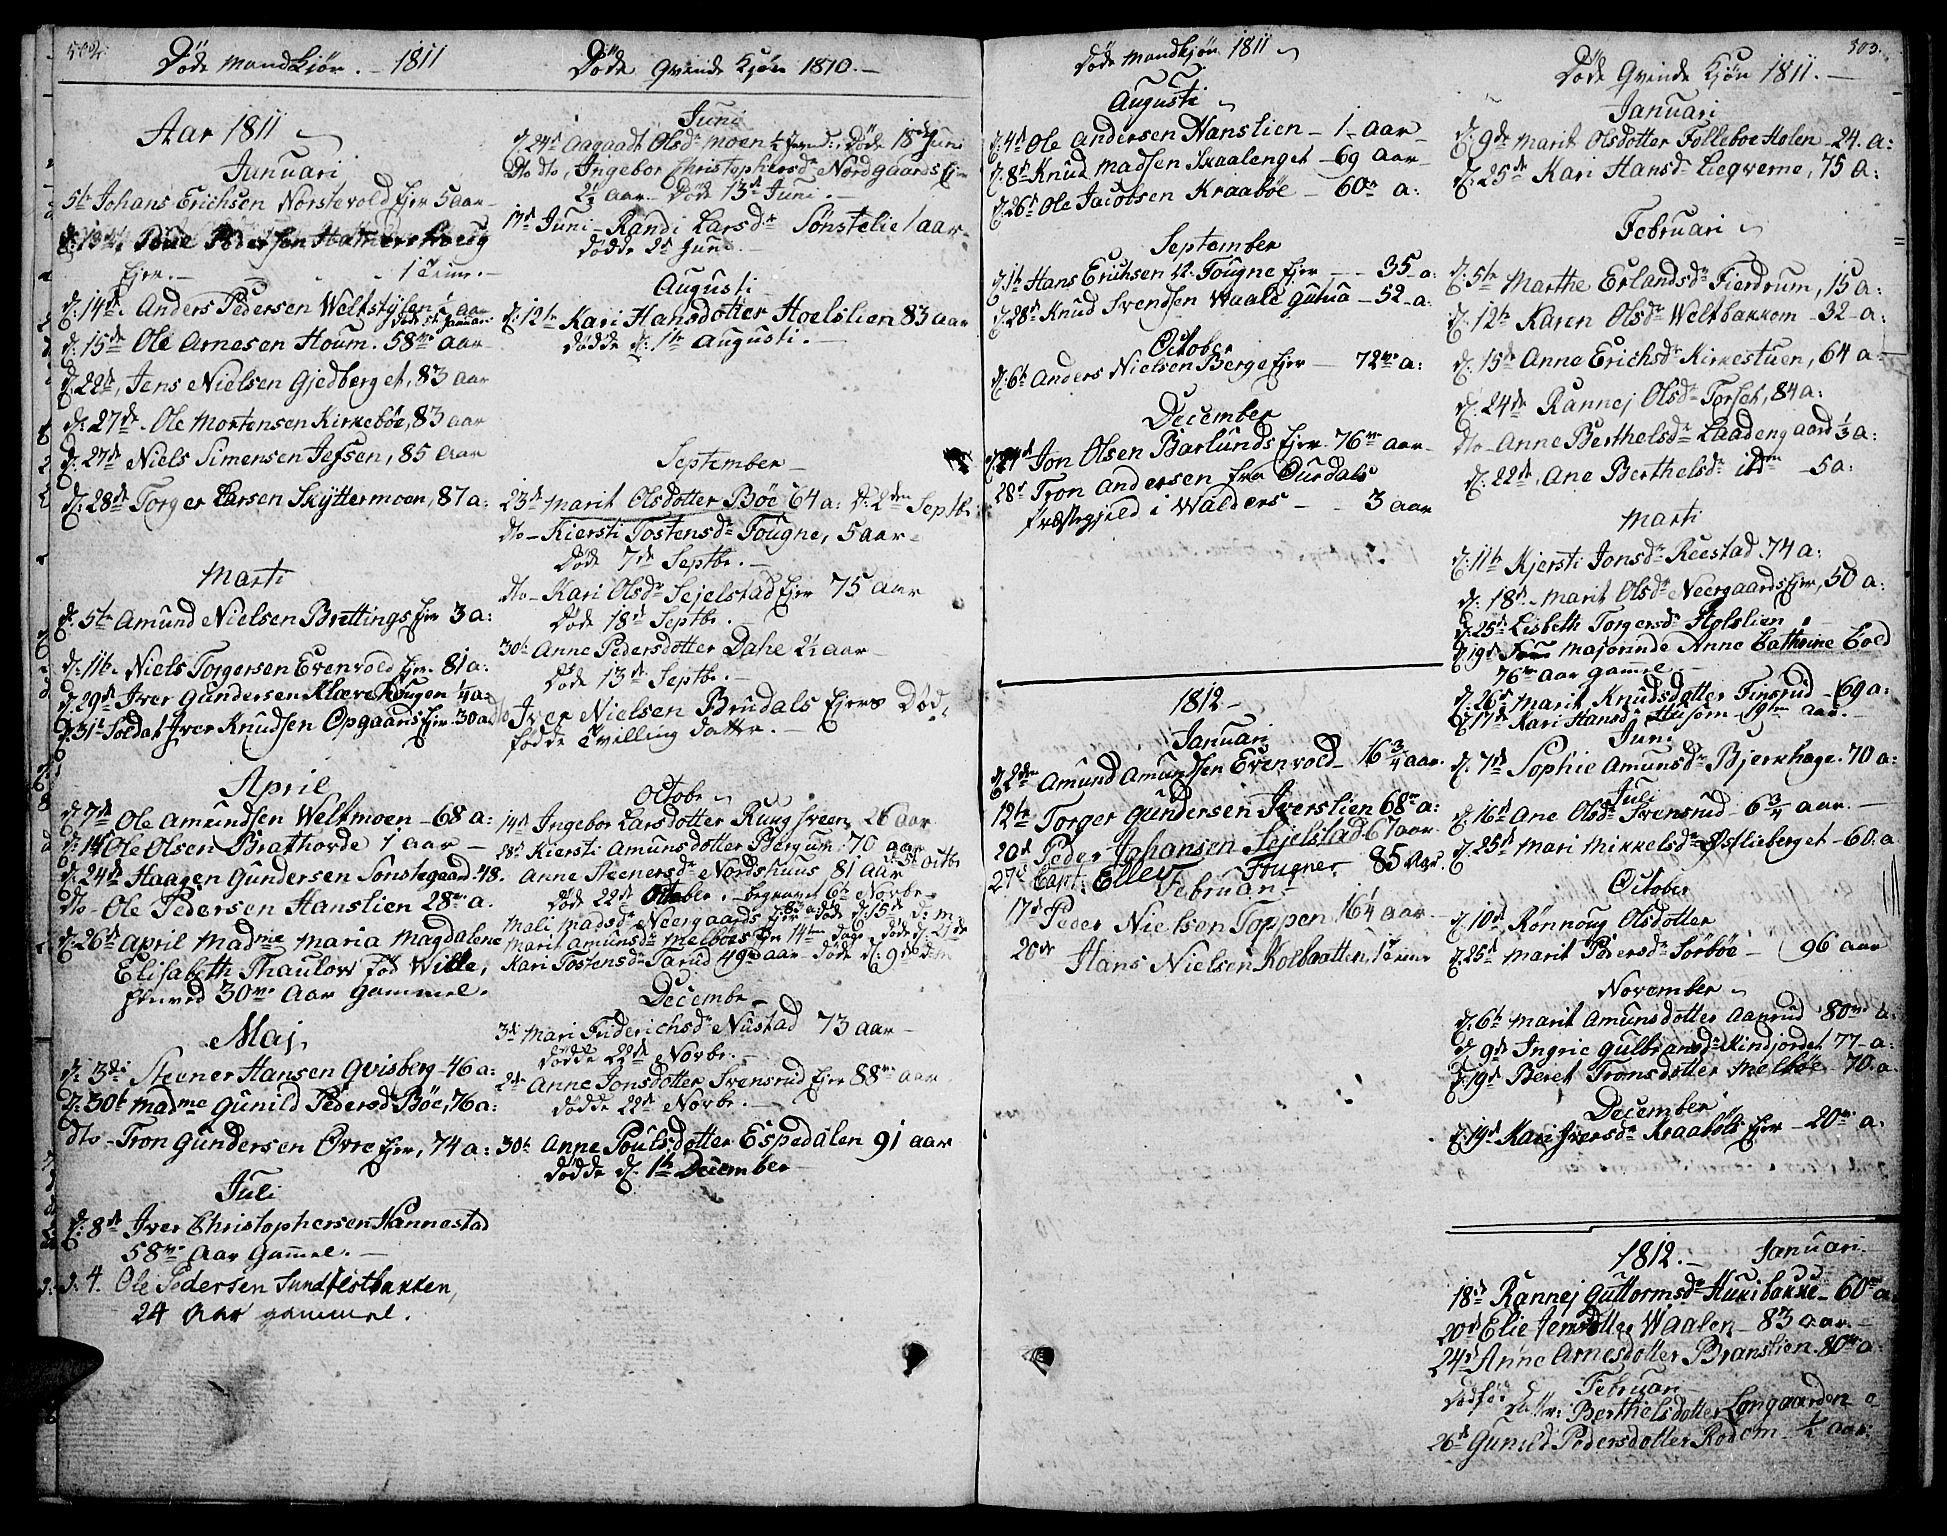 SAH, Gausdal prestekontor, Ministerialbok nr. 4, 1809-1817, s. 502-503